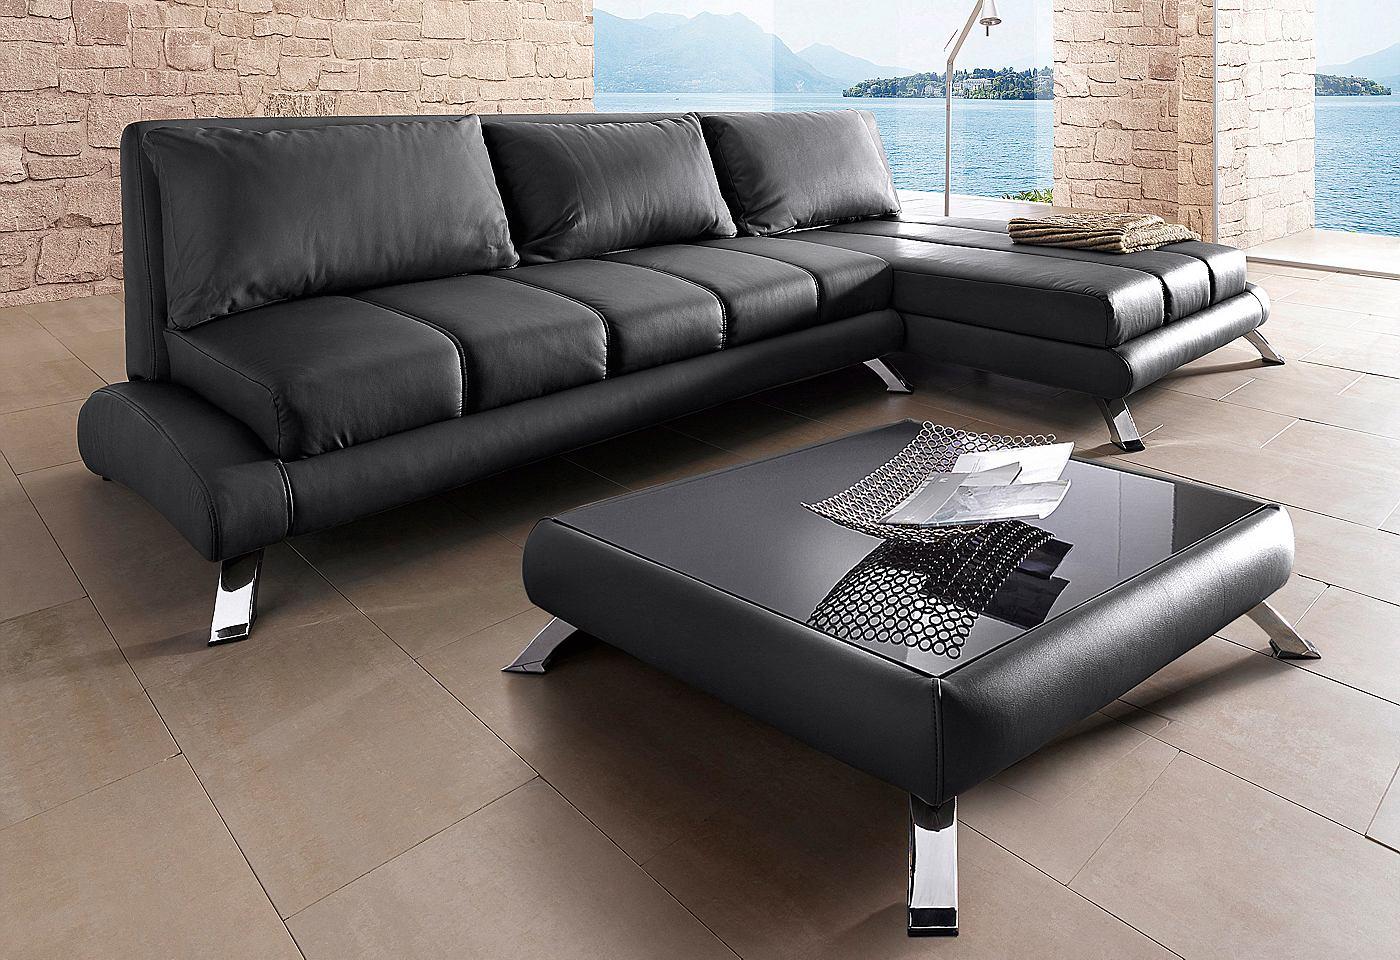 Hoekbank in lounge stijl duifwitgoedservice - Lounge stijl ...